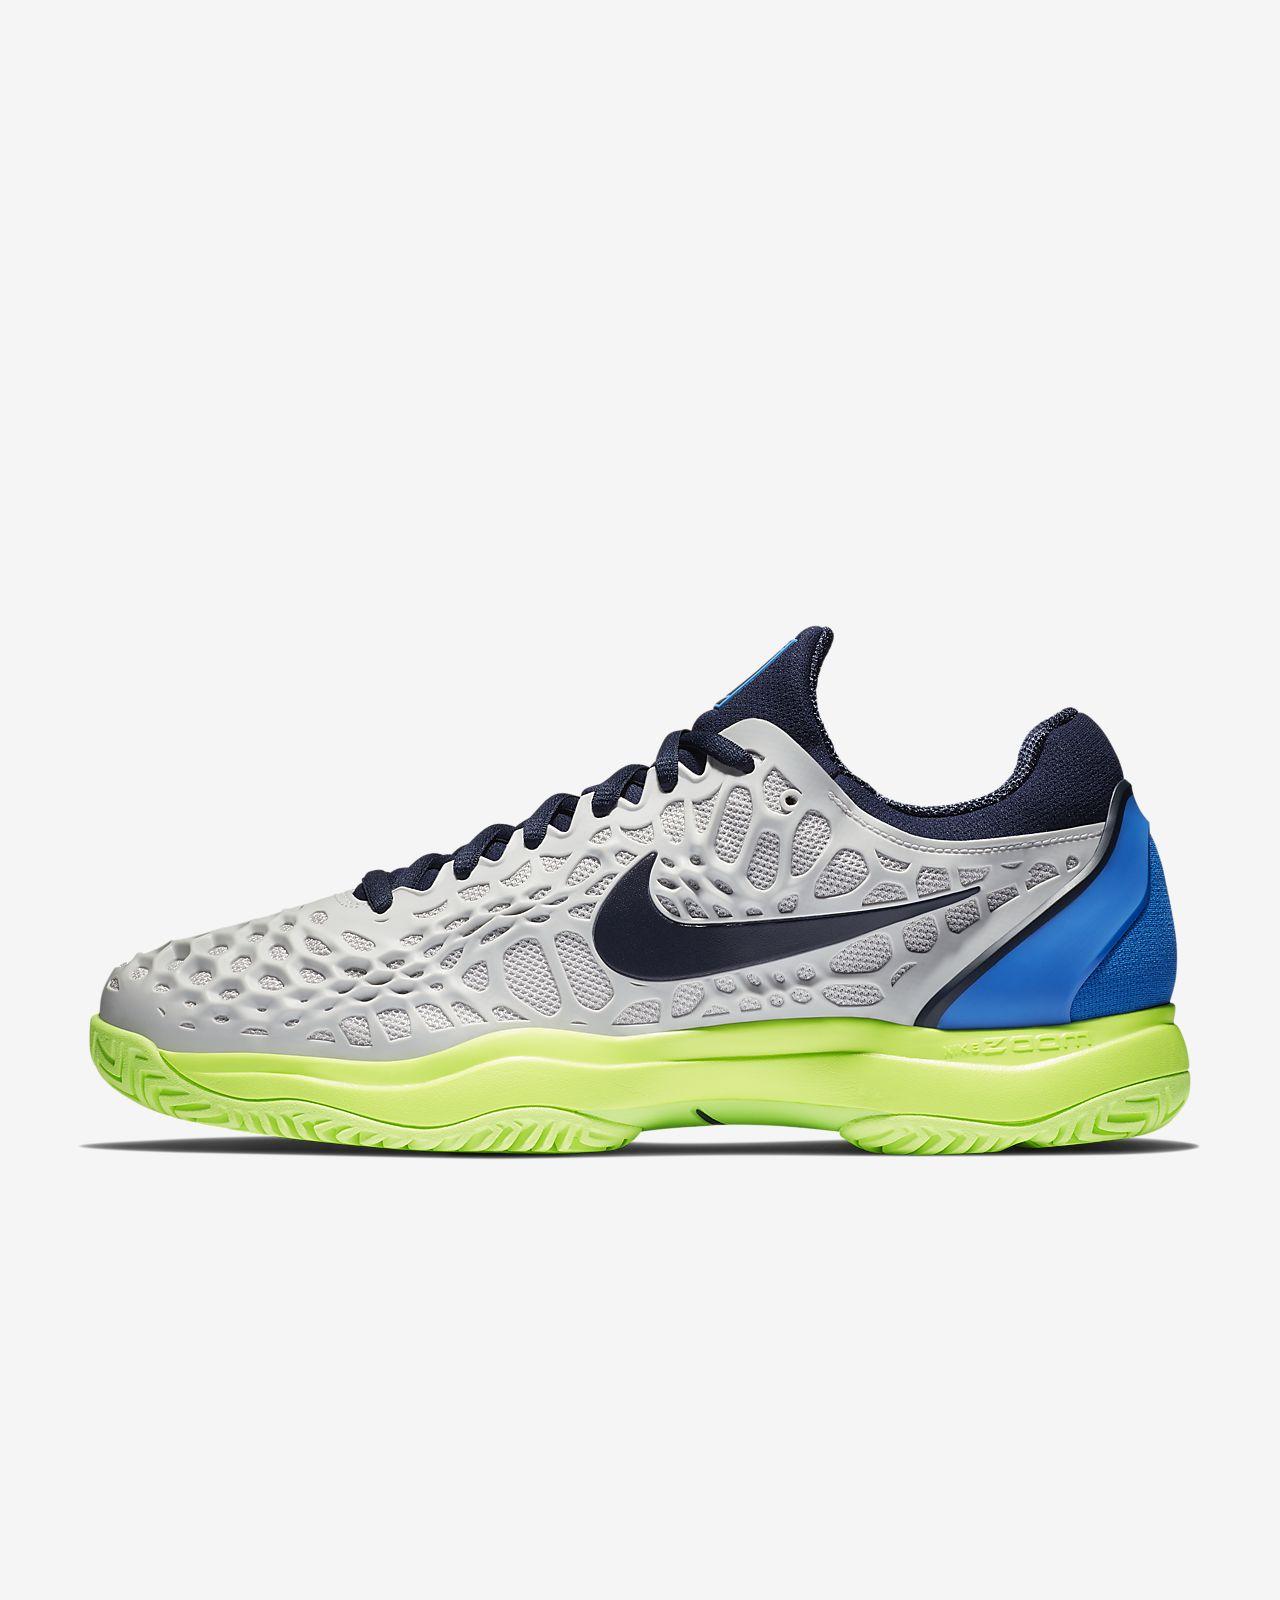 ... nike negro zapatillas españa air max 97 premium f2d30 f52b3  discount  code for calzado de tenis en cancha dura para hombre nikecourt zoom cage 3  3c504 254c32f4588